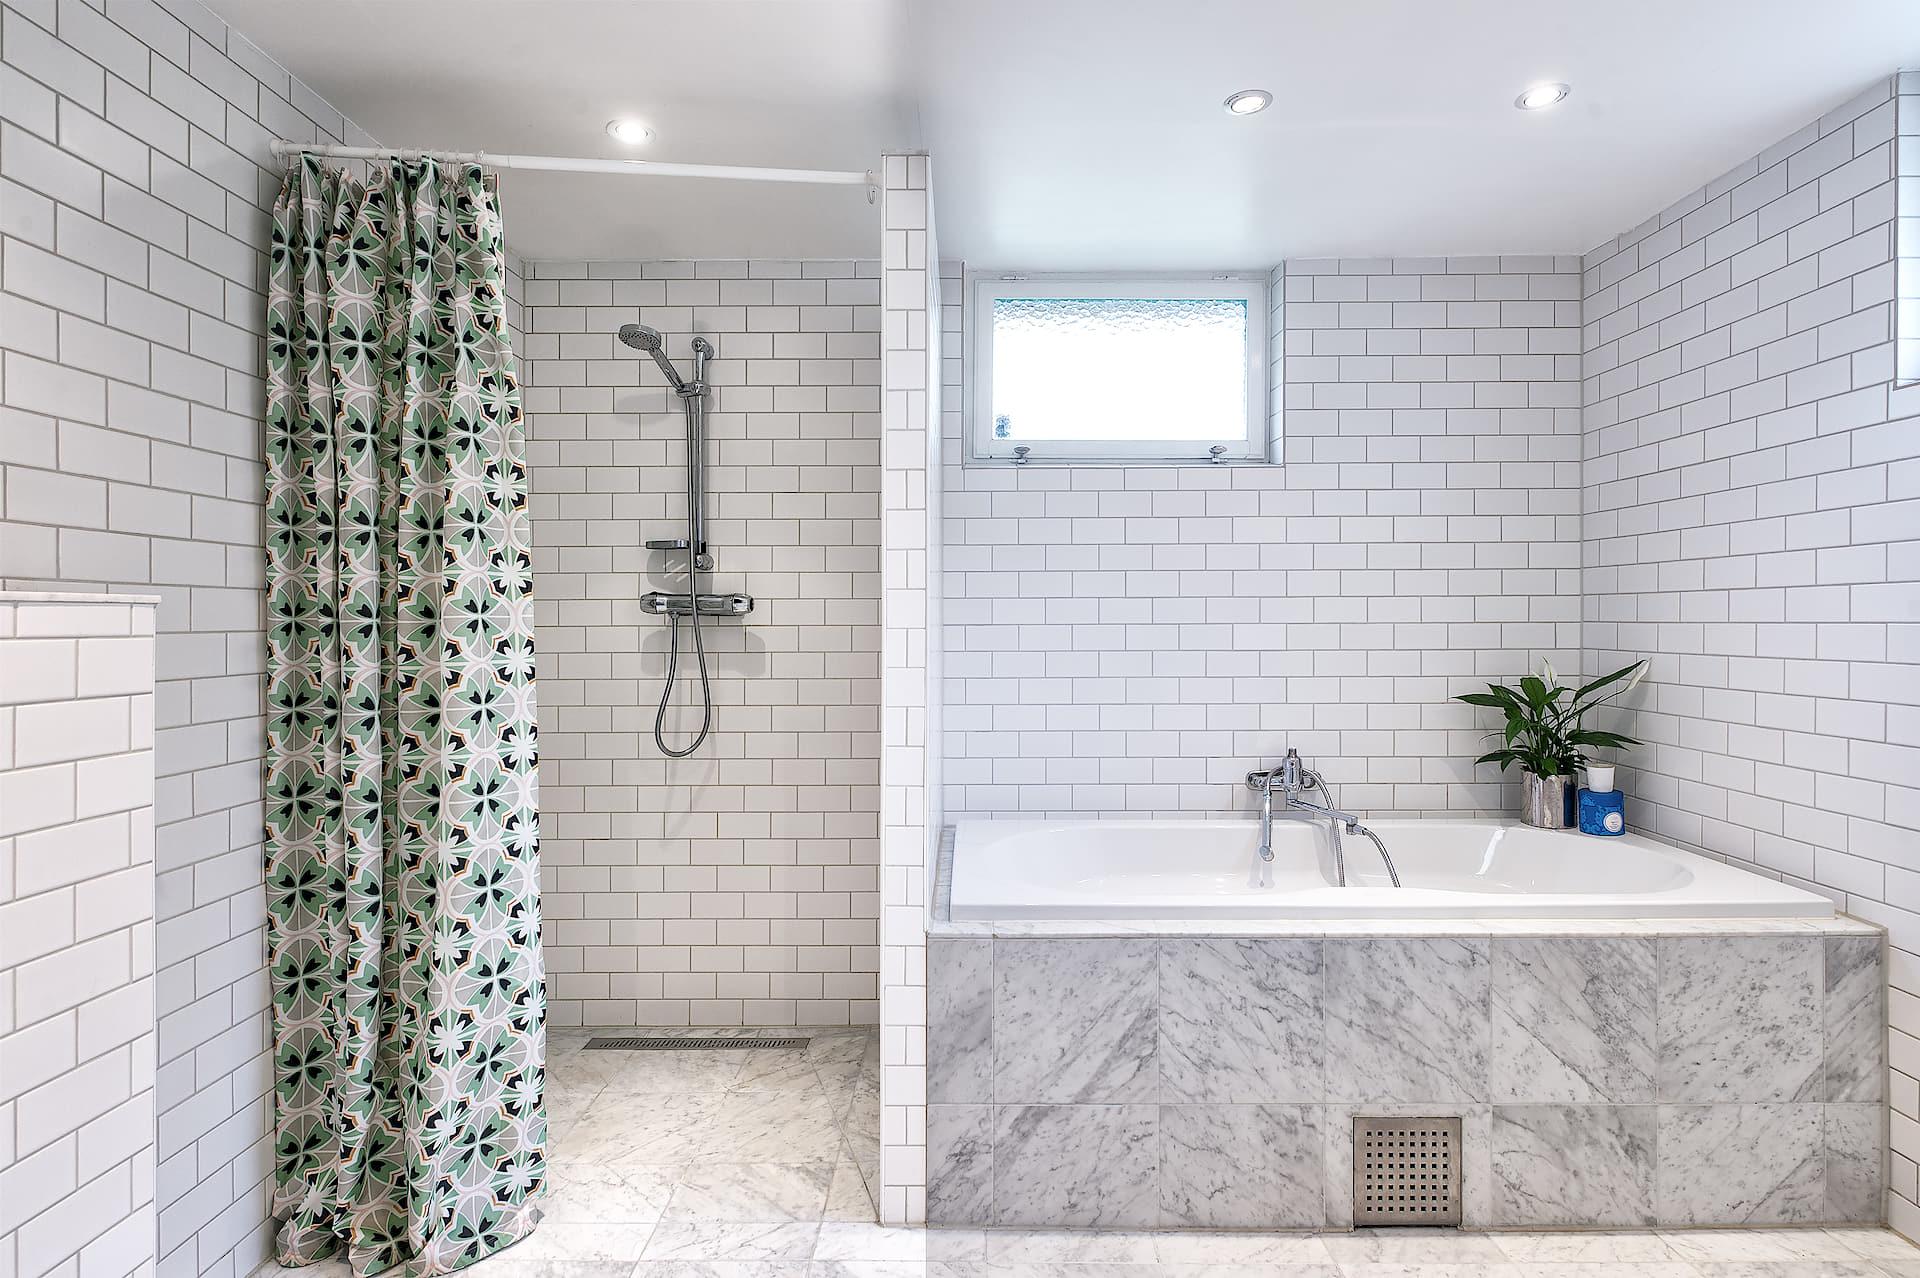 ванная комната ванна мраморная плитка душевая кабина трап штора плитка кабанчик